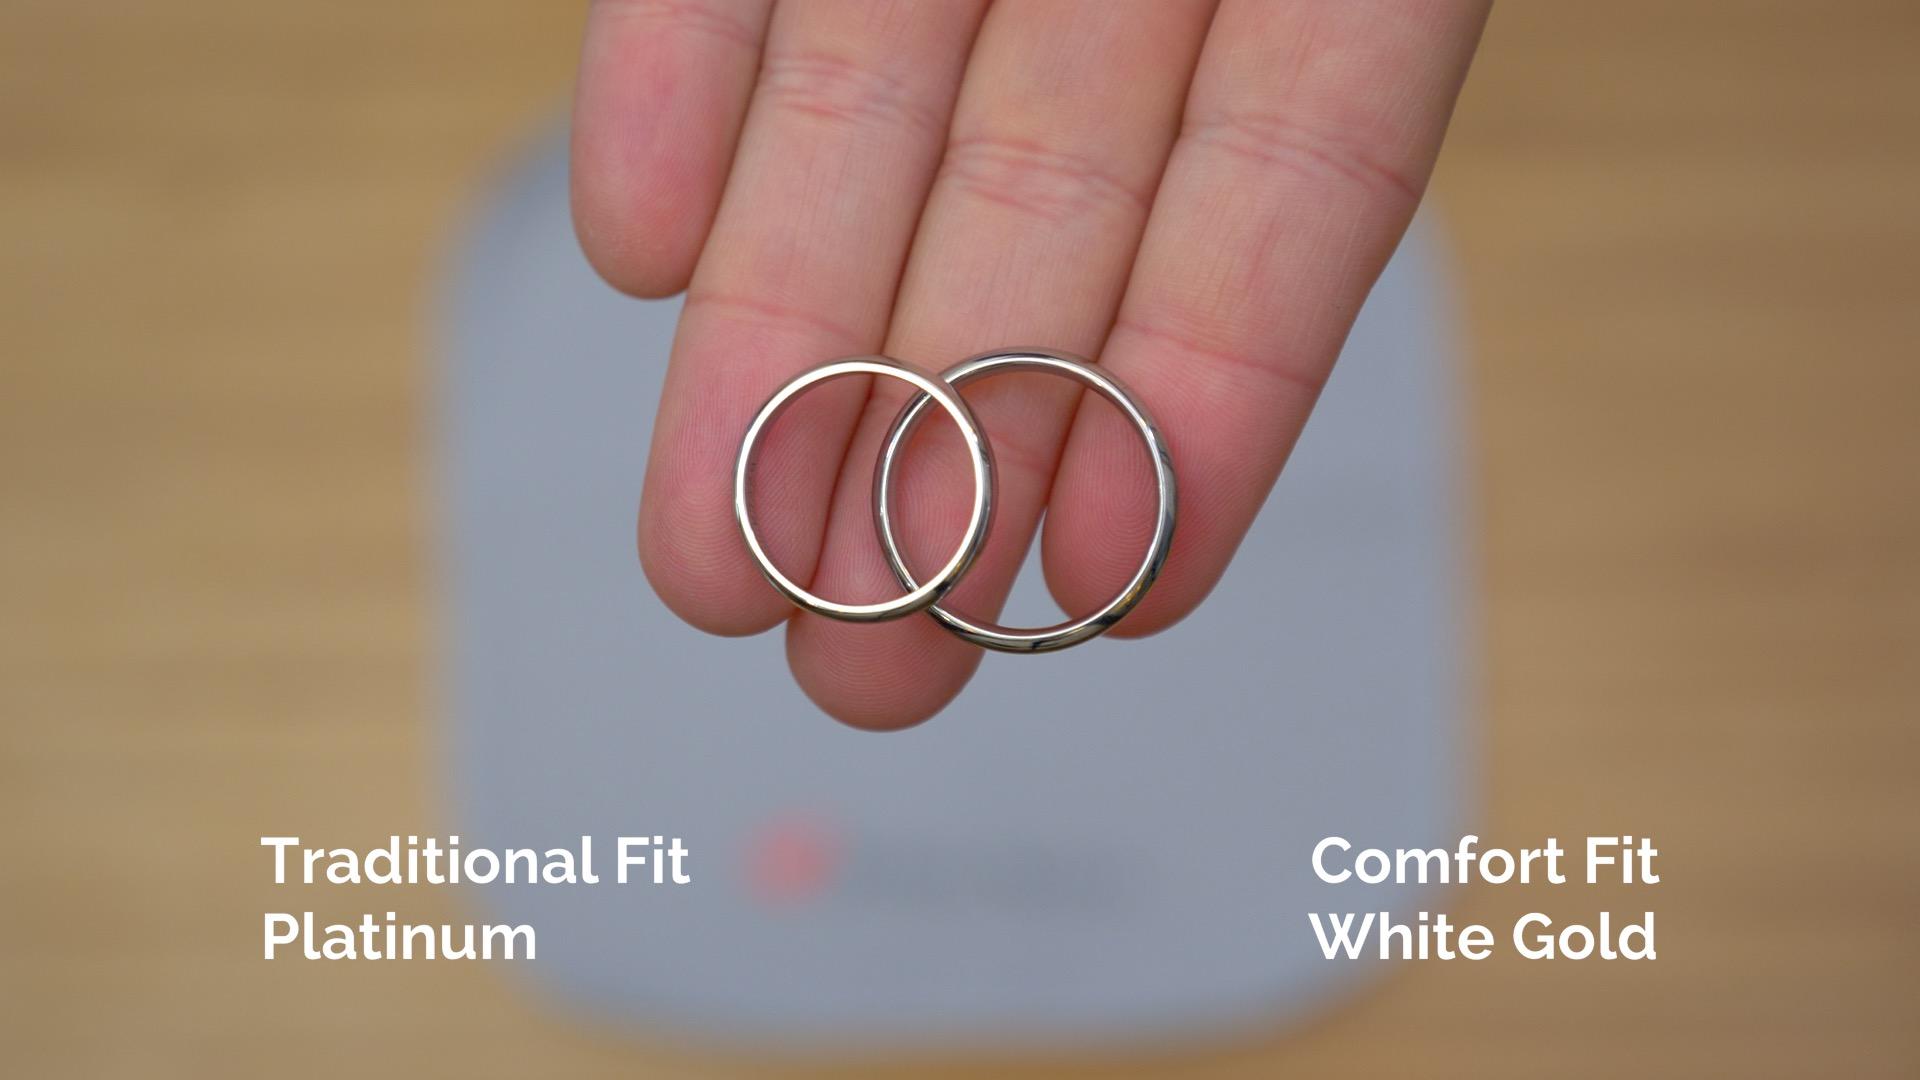 Standard vs comfort fit